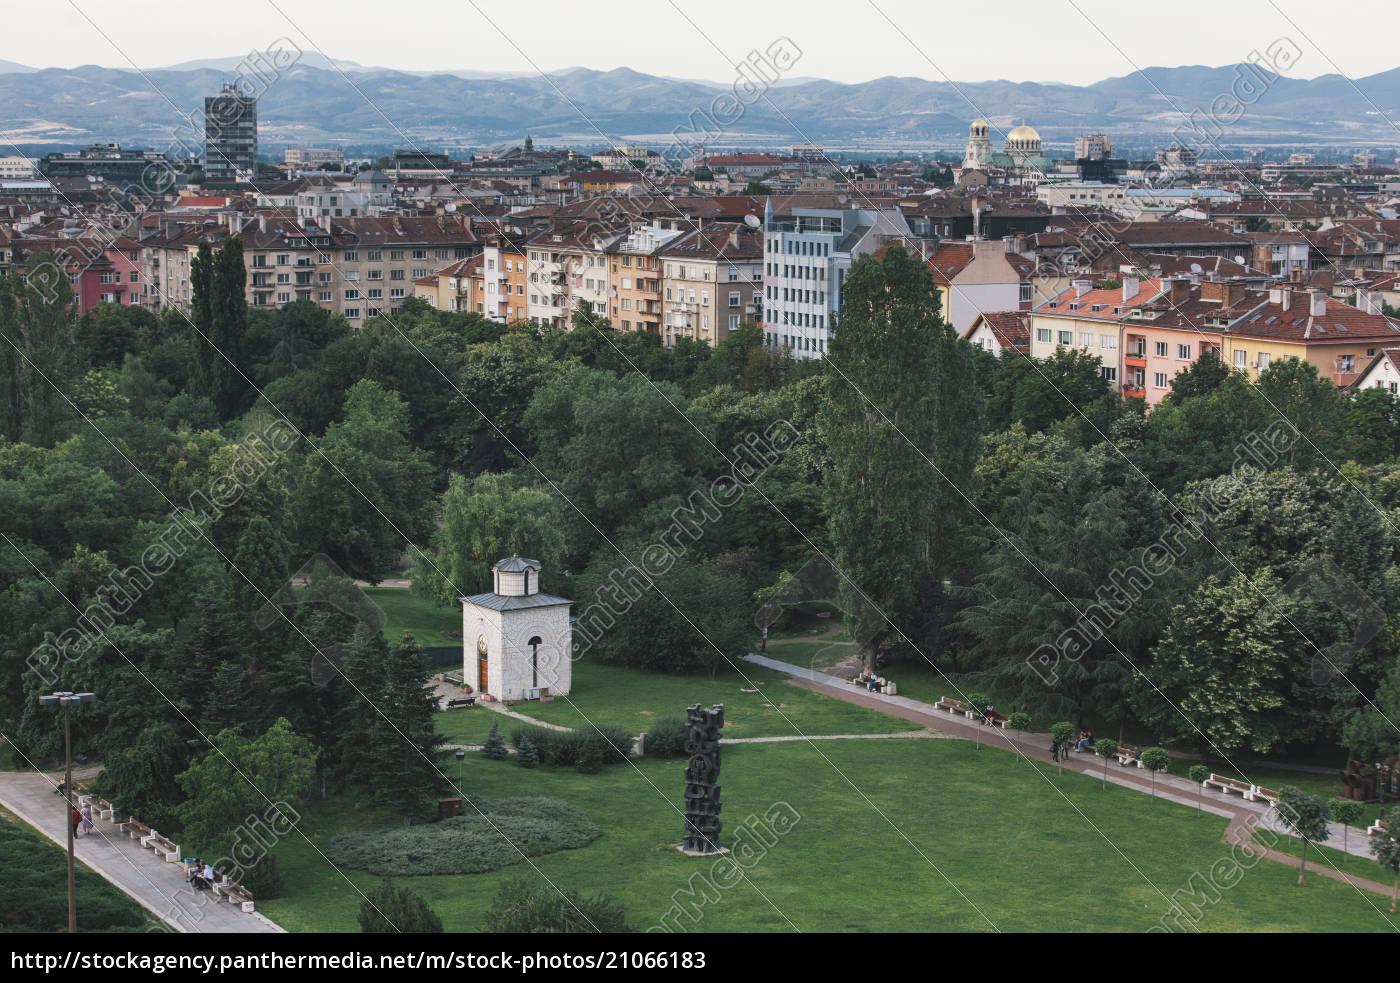 bulgarien, sofia, stadtansicht, blick, vom, nationalen, kulturpalast, zum, park - 21066183